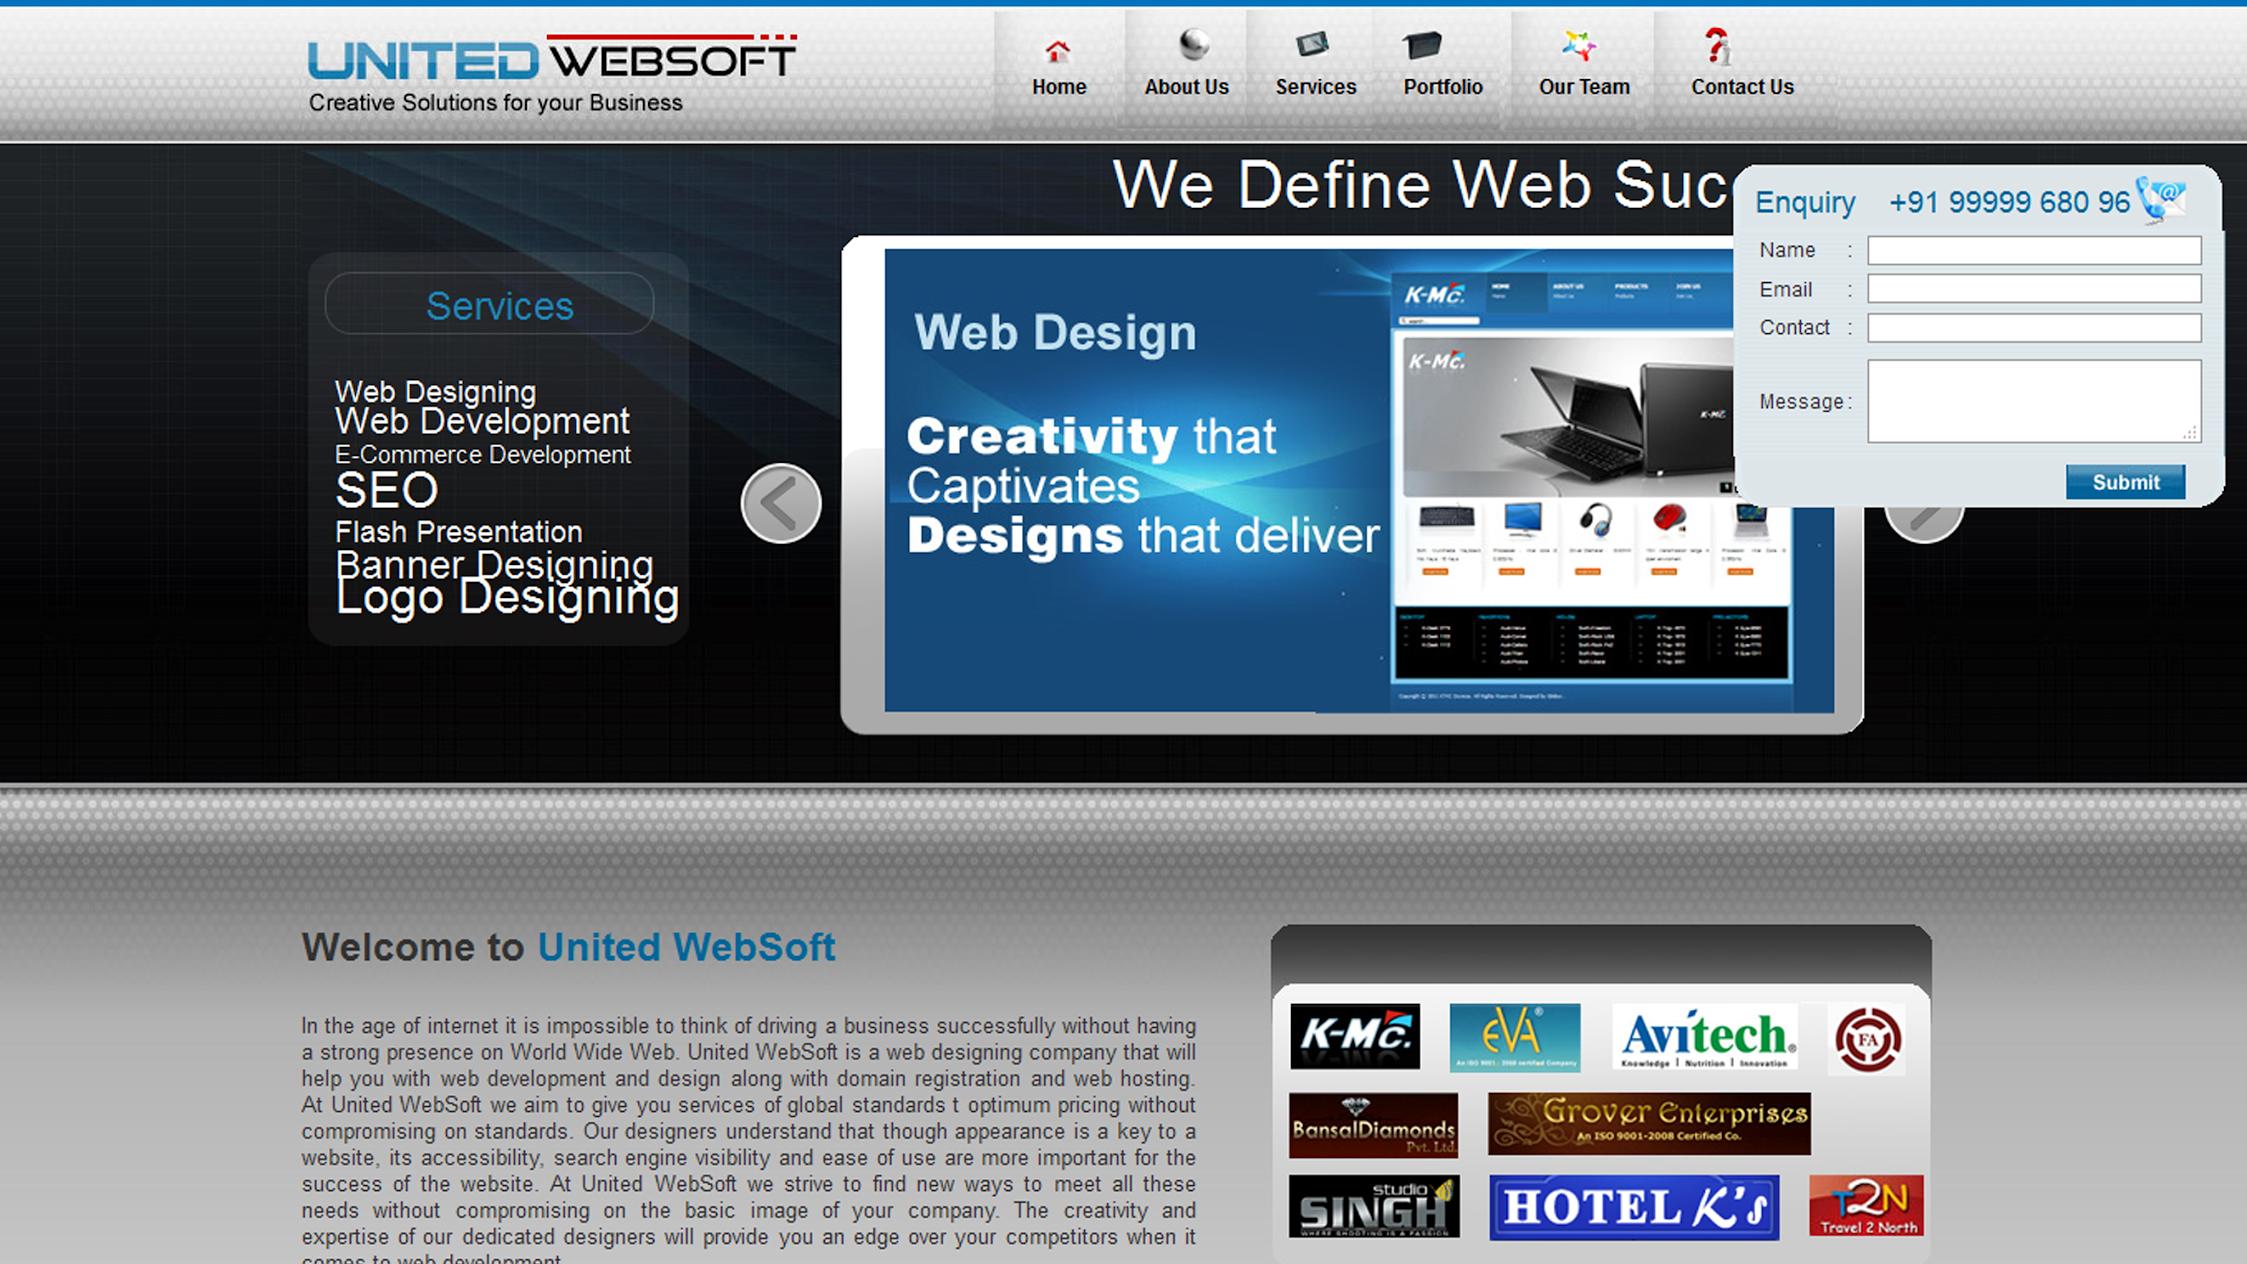 UnitedWebSoft